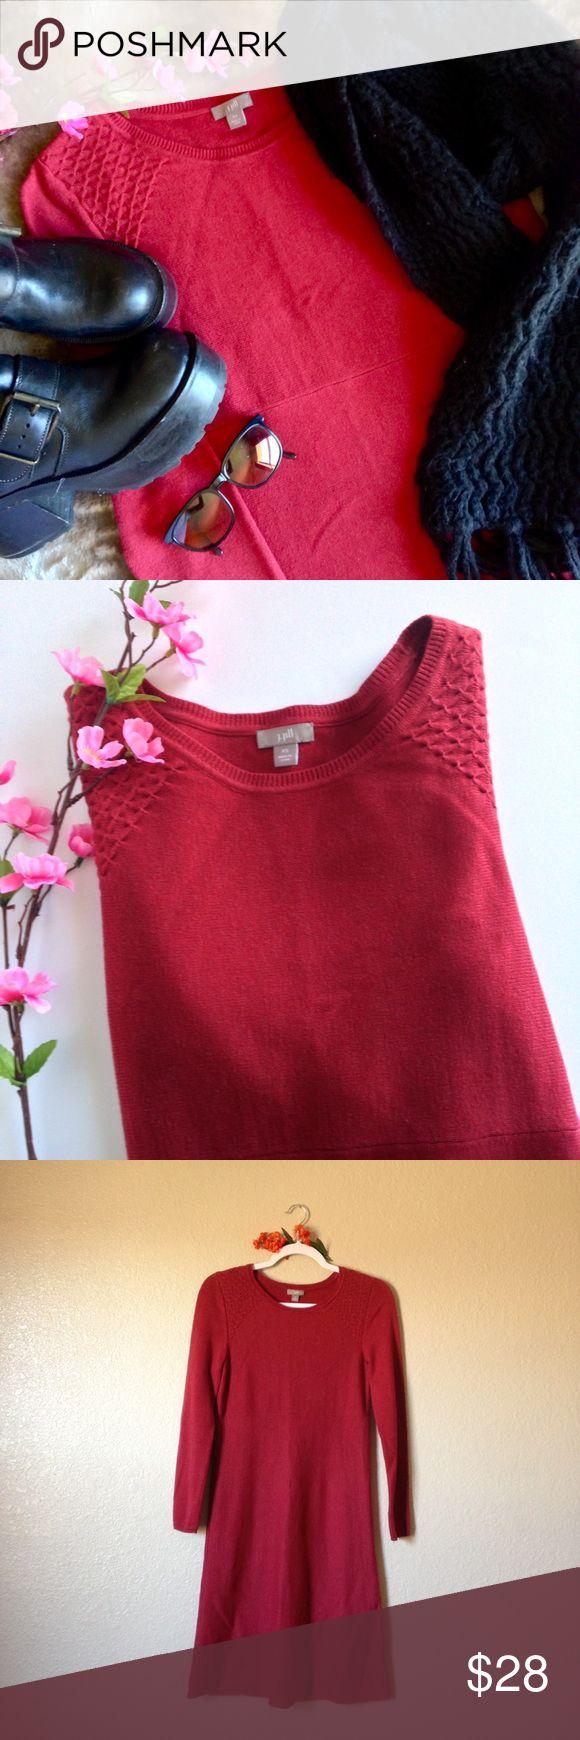 J. Jill Long Sleeve Sweater Dress Beautiful J. Jill red sweater dress, gently used, size XS. I accept reasonable offers ☺ J. Jill Dresses Midi